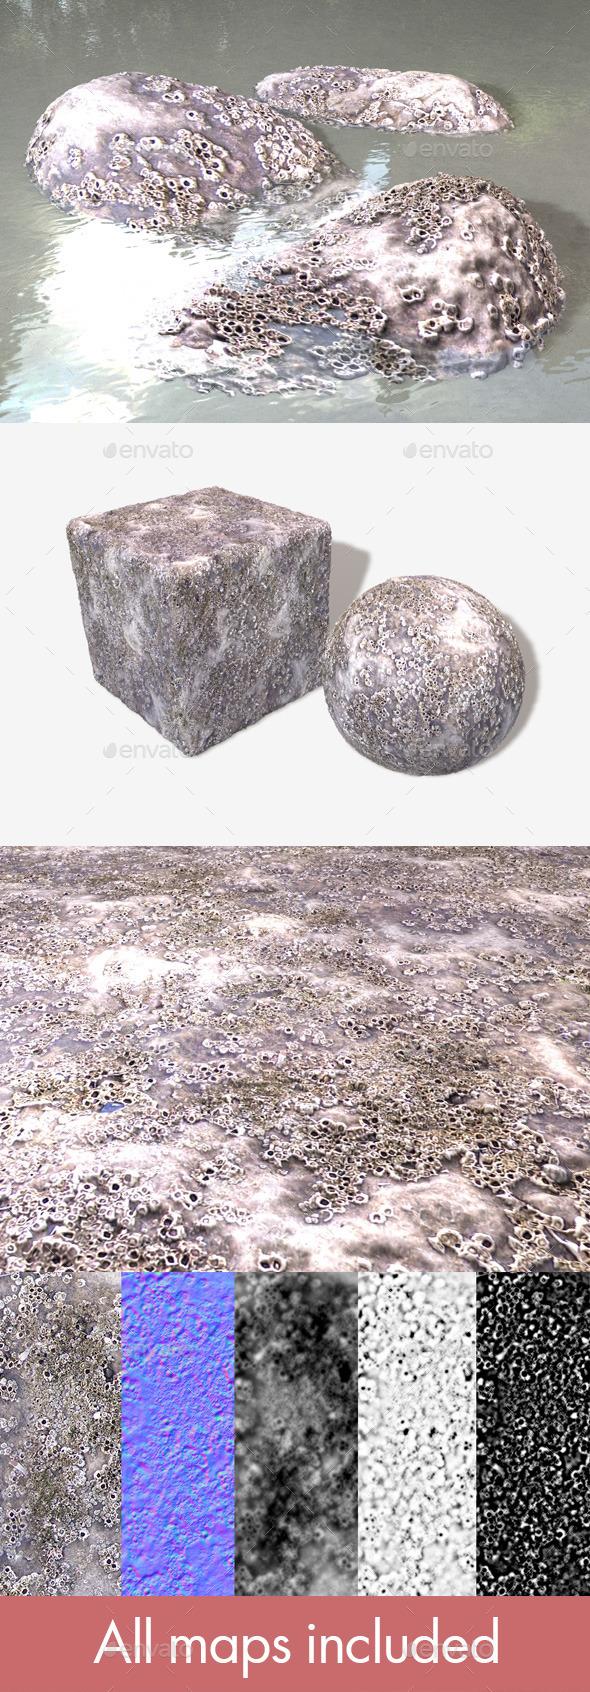 Barnacle Crustacean Seamless Texture - 3DOcean Item for Sale